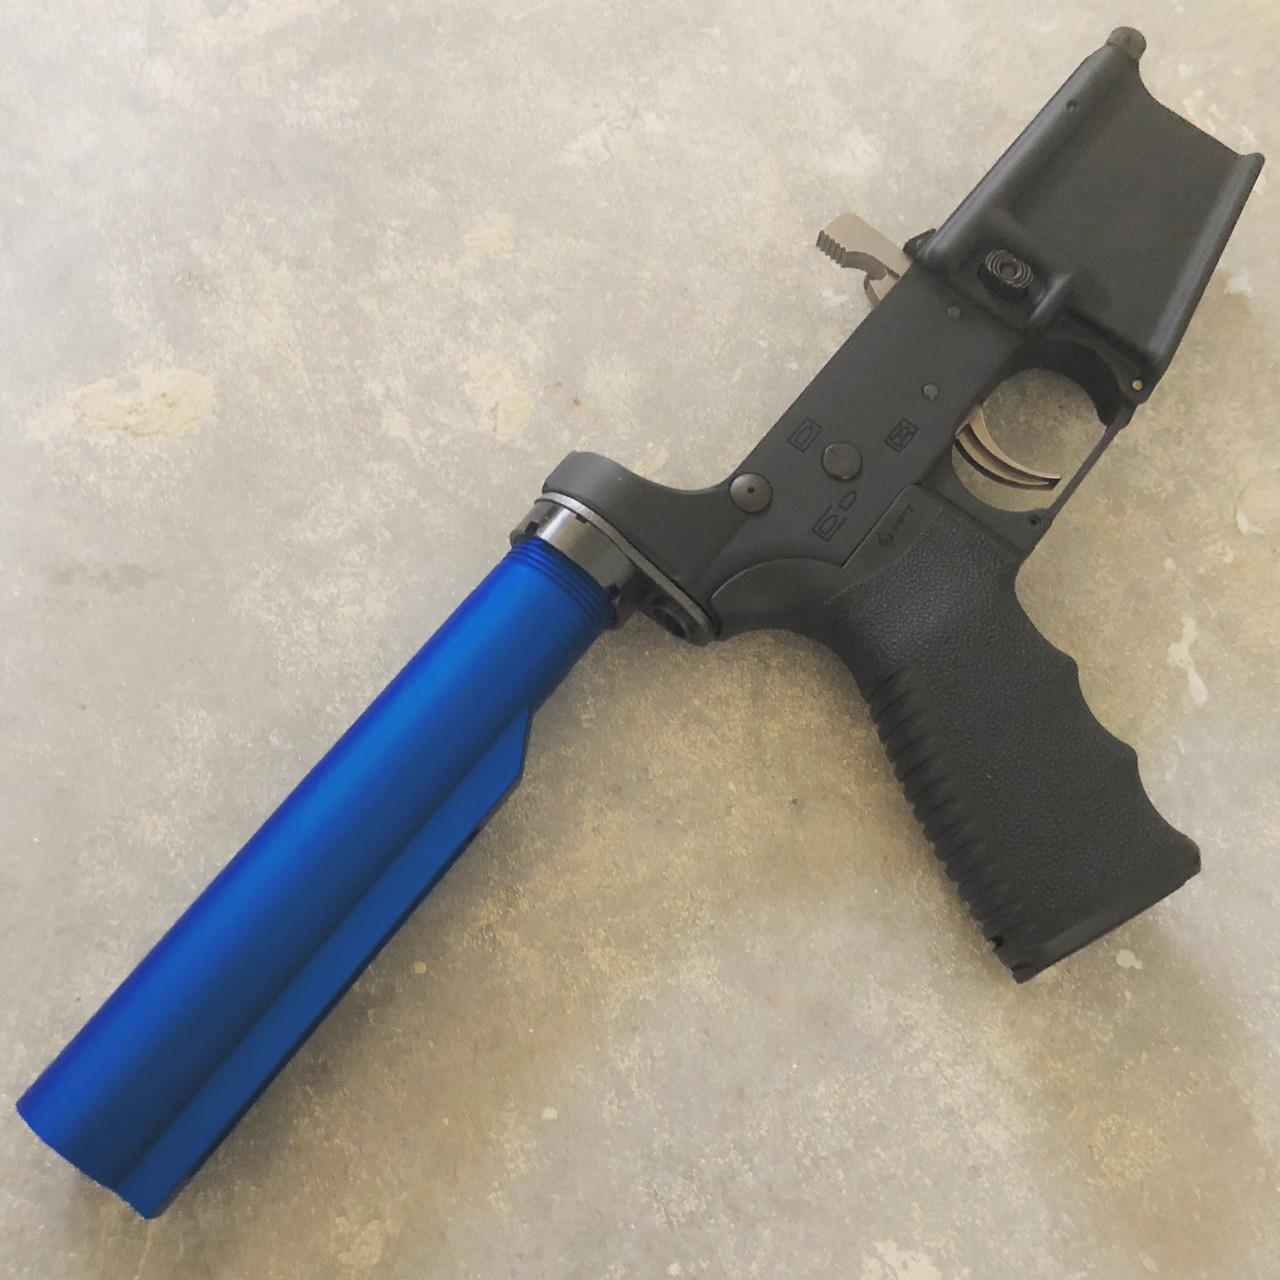 MCS Blue Anodized Mil-Spec 6-Position Buffer Tube